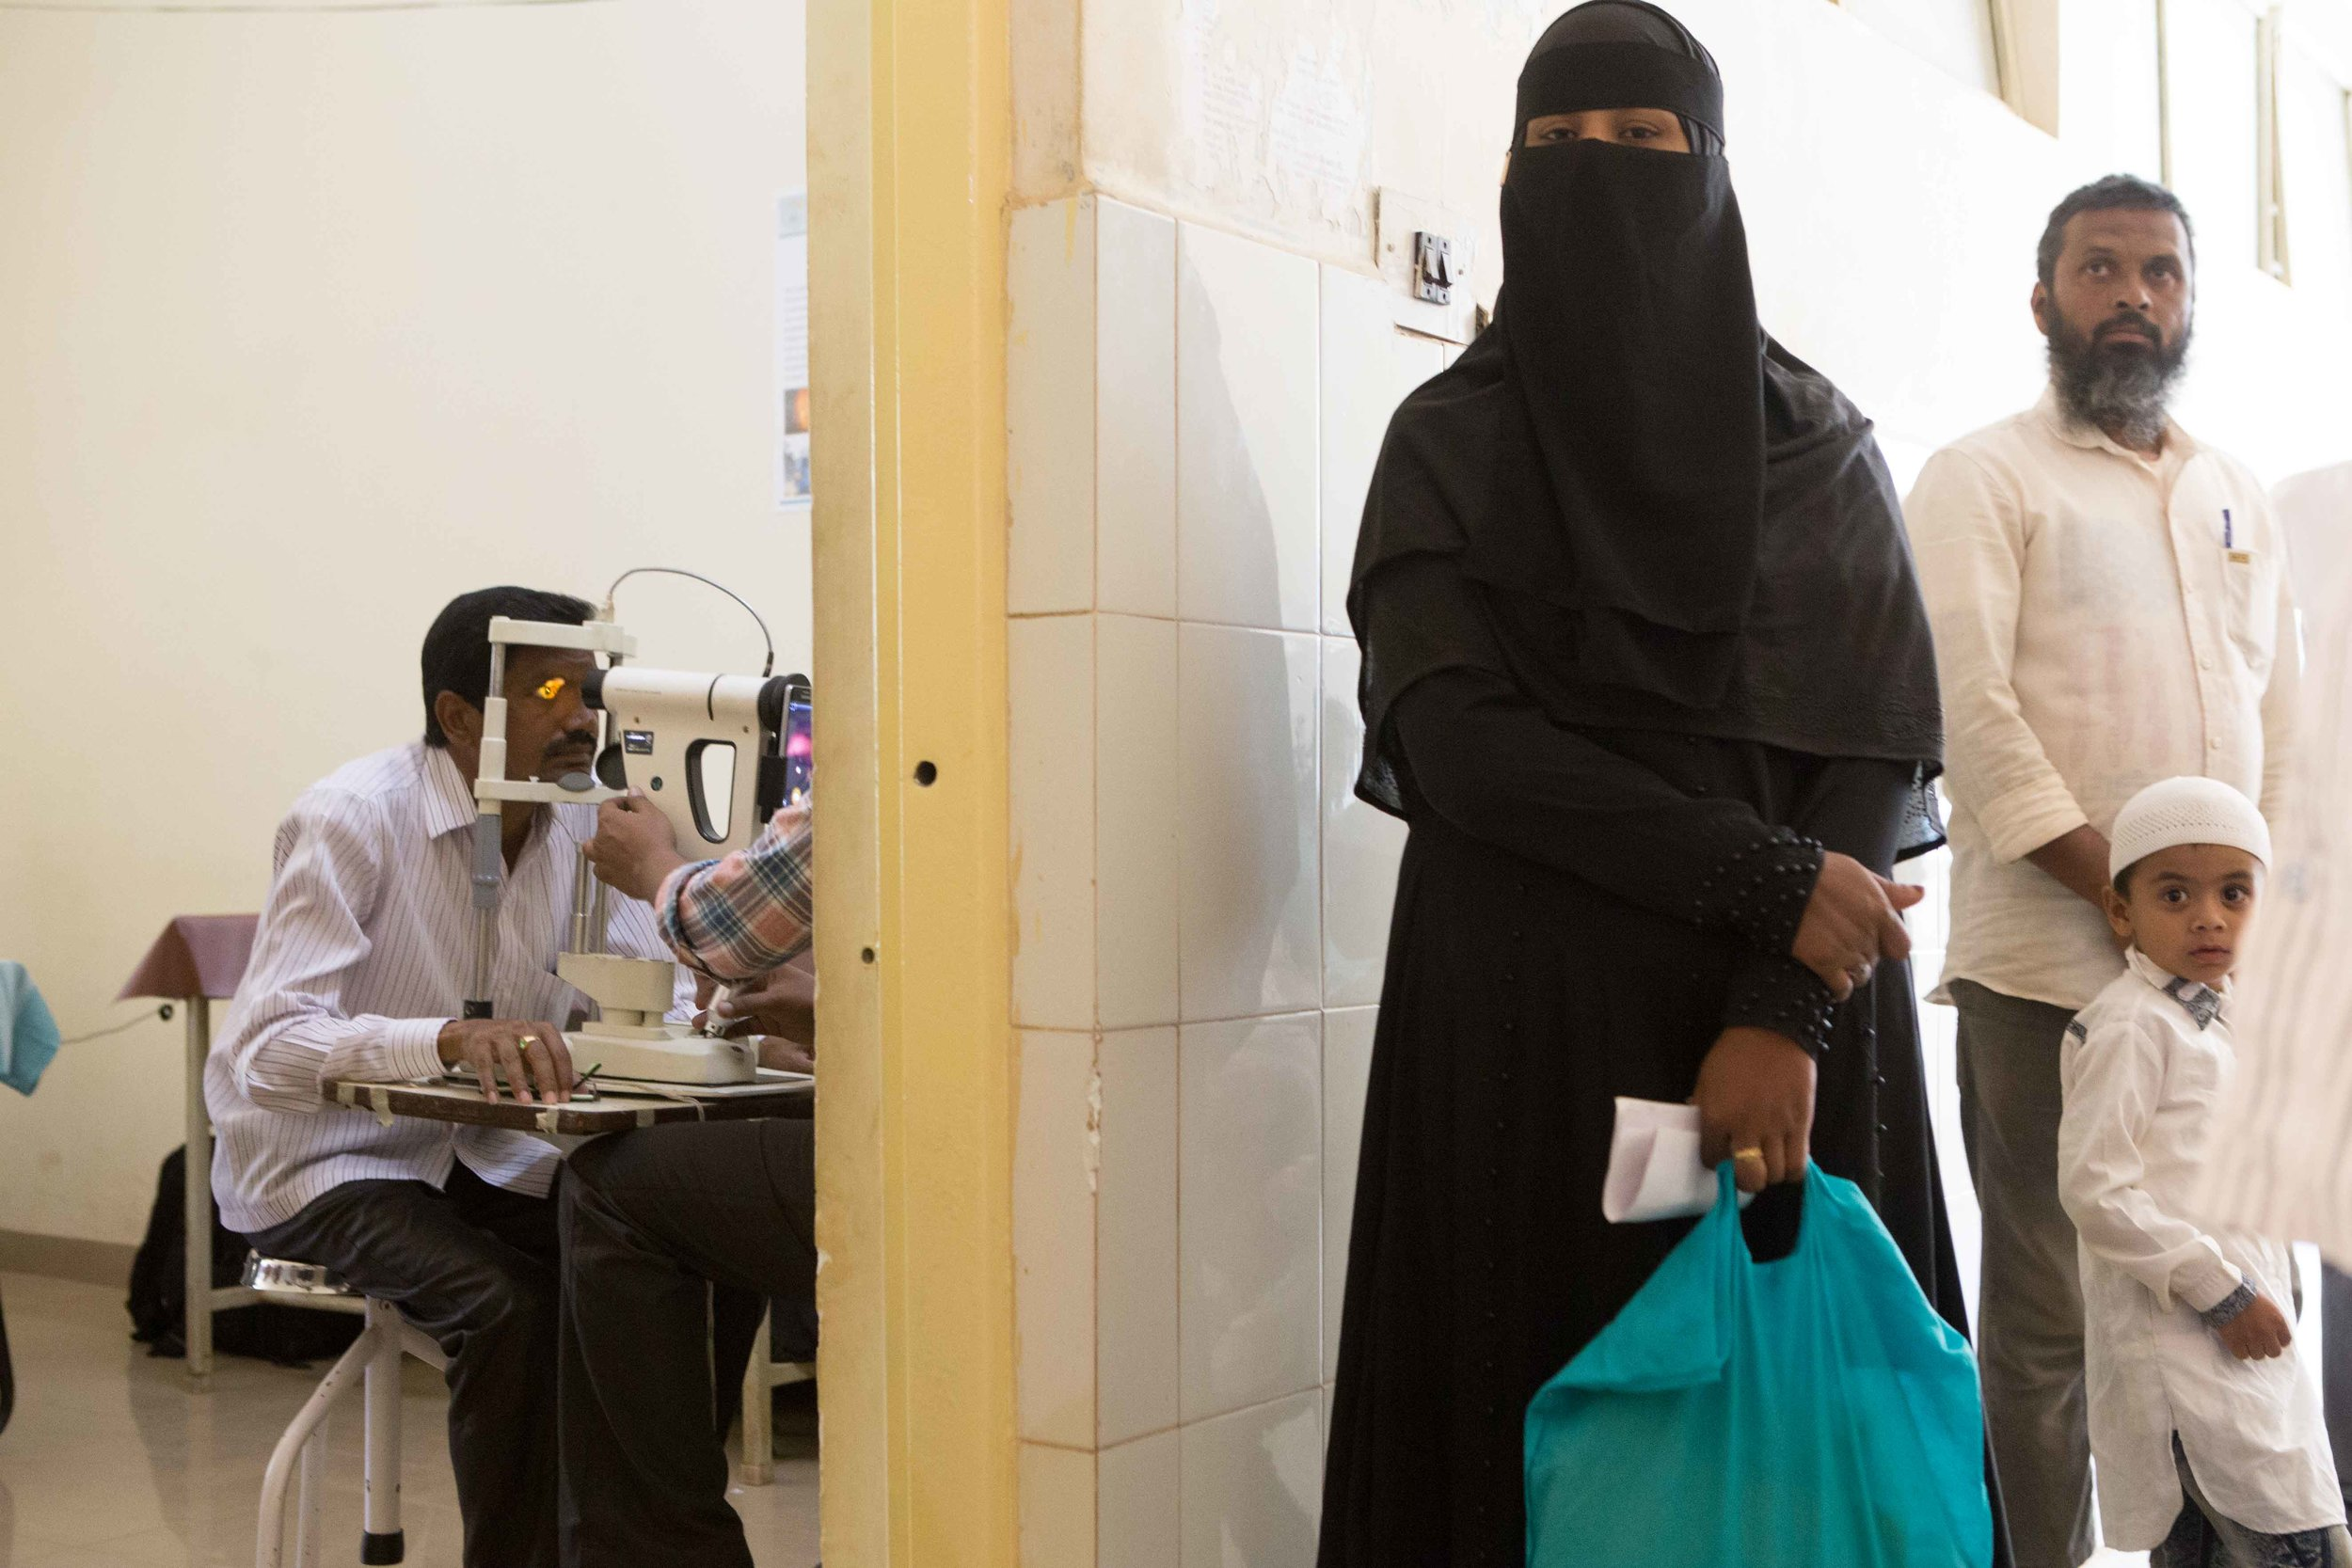 Retina examination in process. District Hospital Tumkur, Karnataka